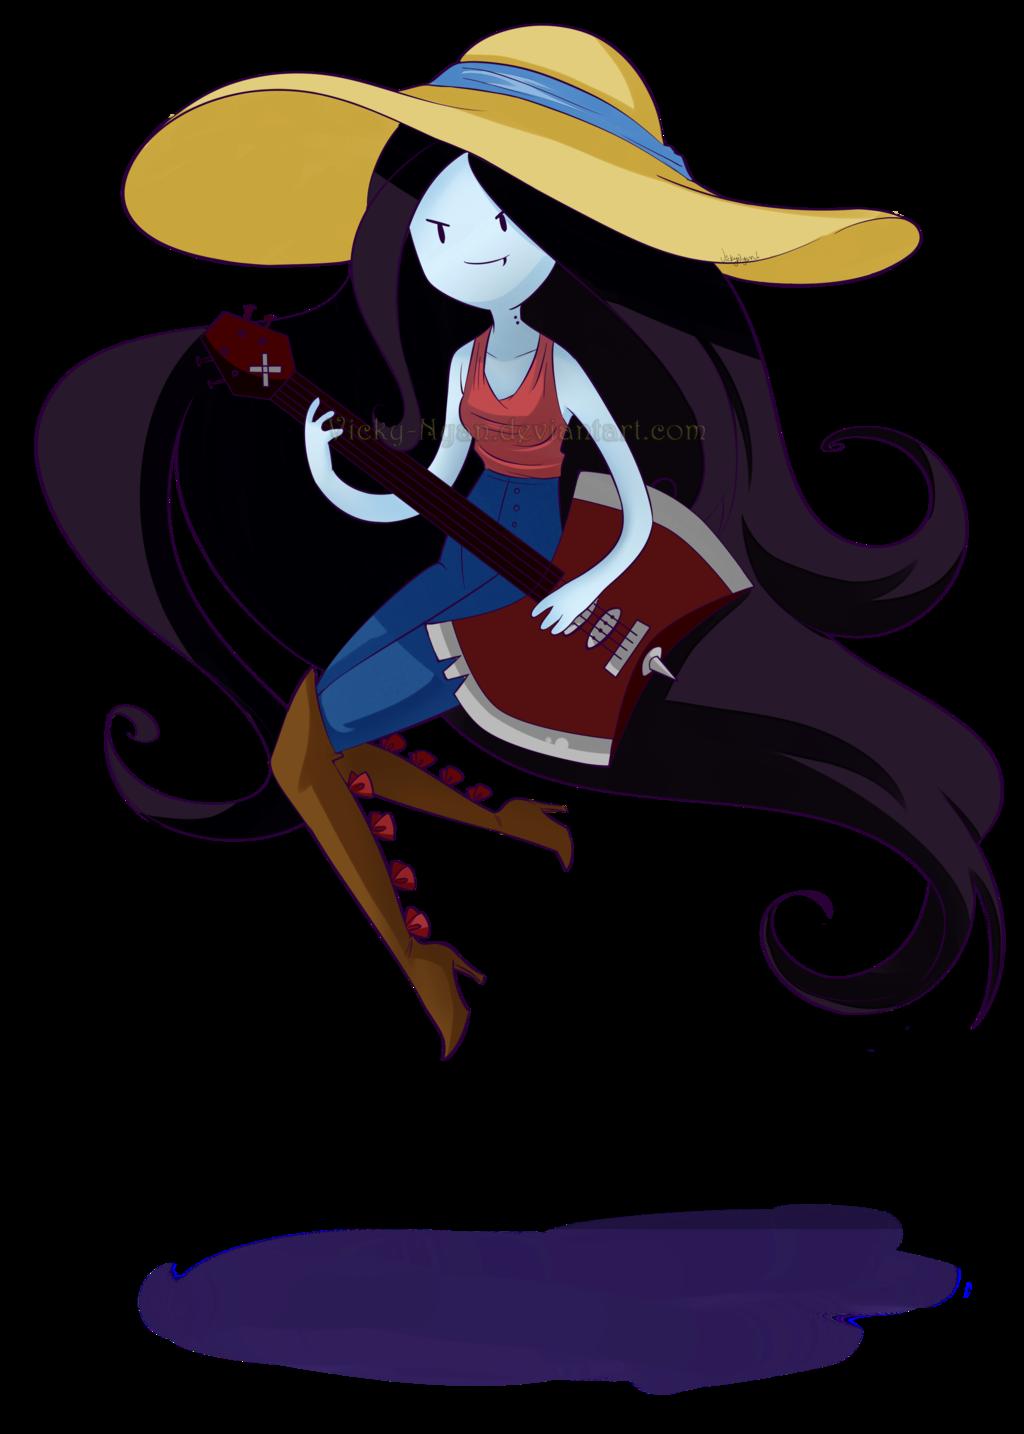 Adventure Time Party Adventure Time Marceline Adventure Time Cosplay Marceline The Vampire Queen